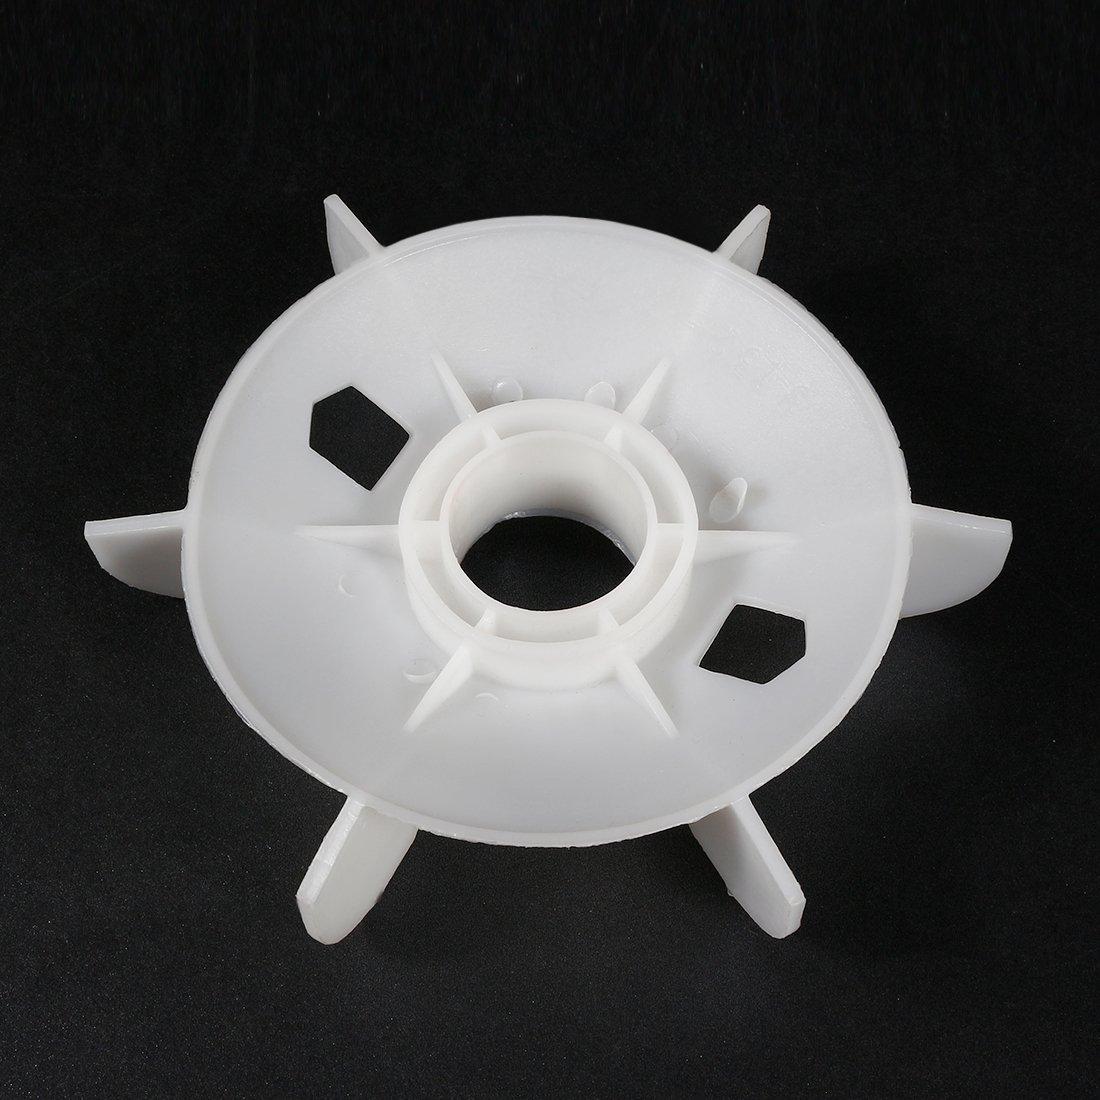 28mm Runde Welle Ersatz Kunststoff 6 Laufradmotor Ventilator Schaufel sourcing map 1stk 150